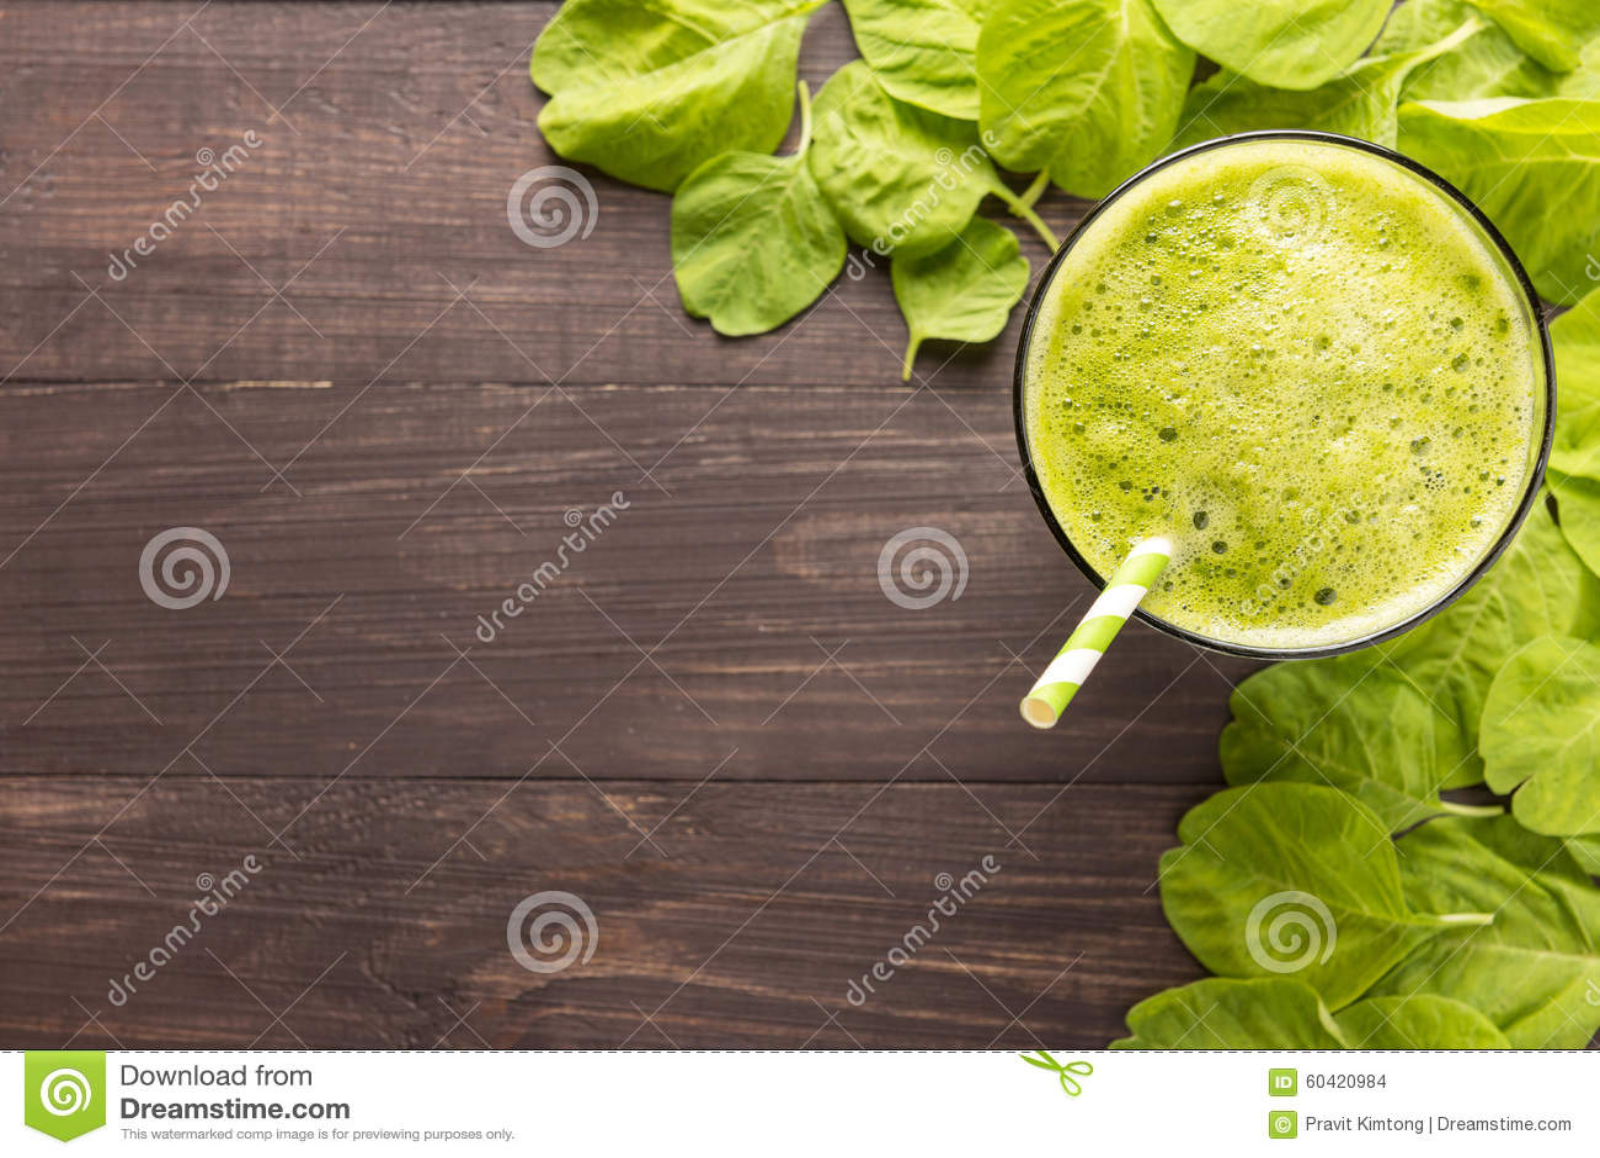 How to Make Raw Green Avocado Shake pics